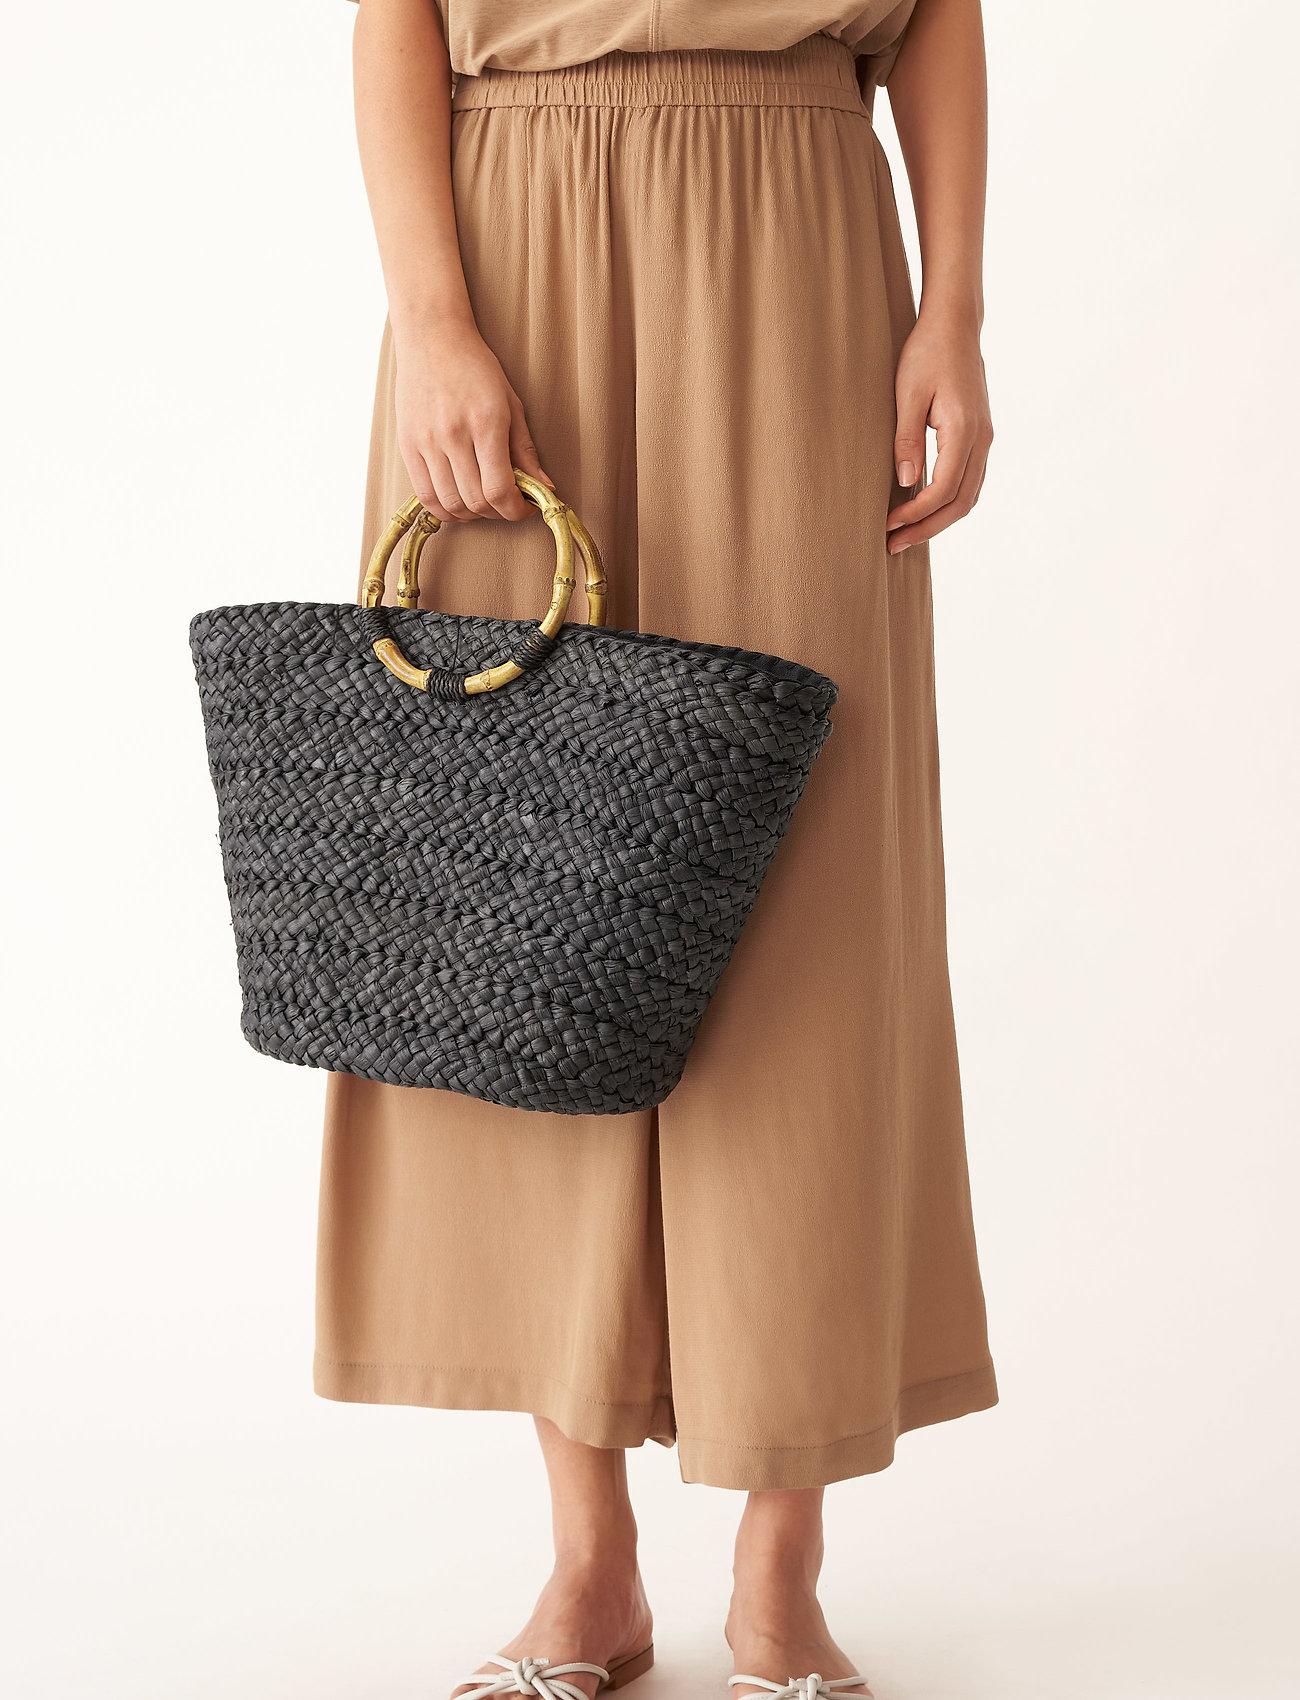 Wera - DENISE - bucket bags - black - 0